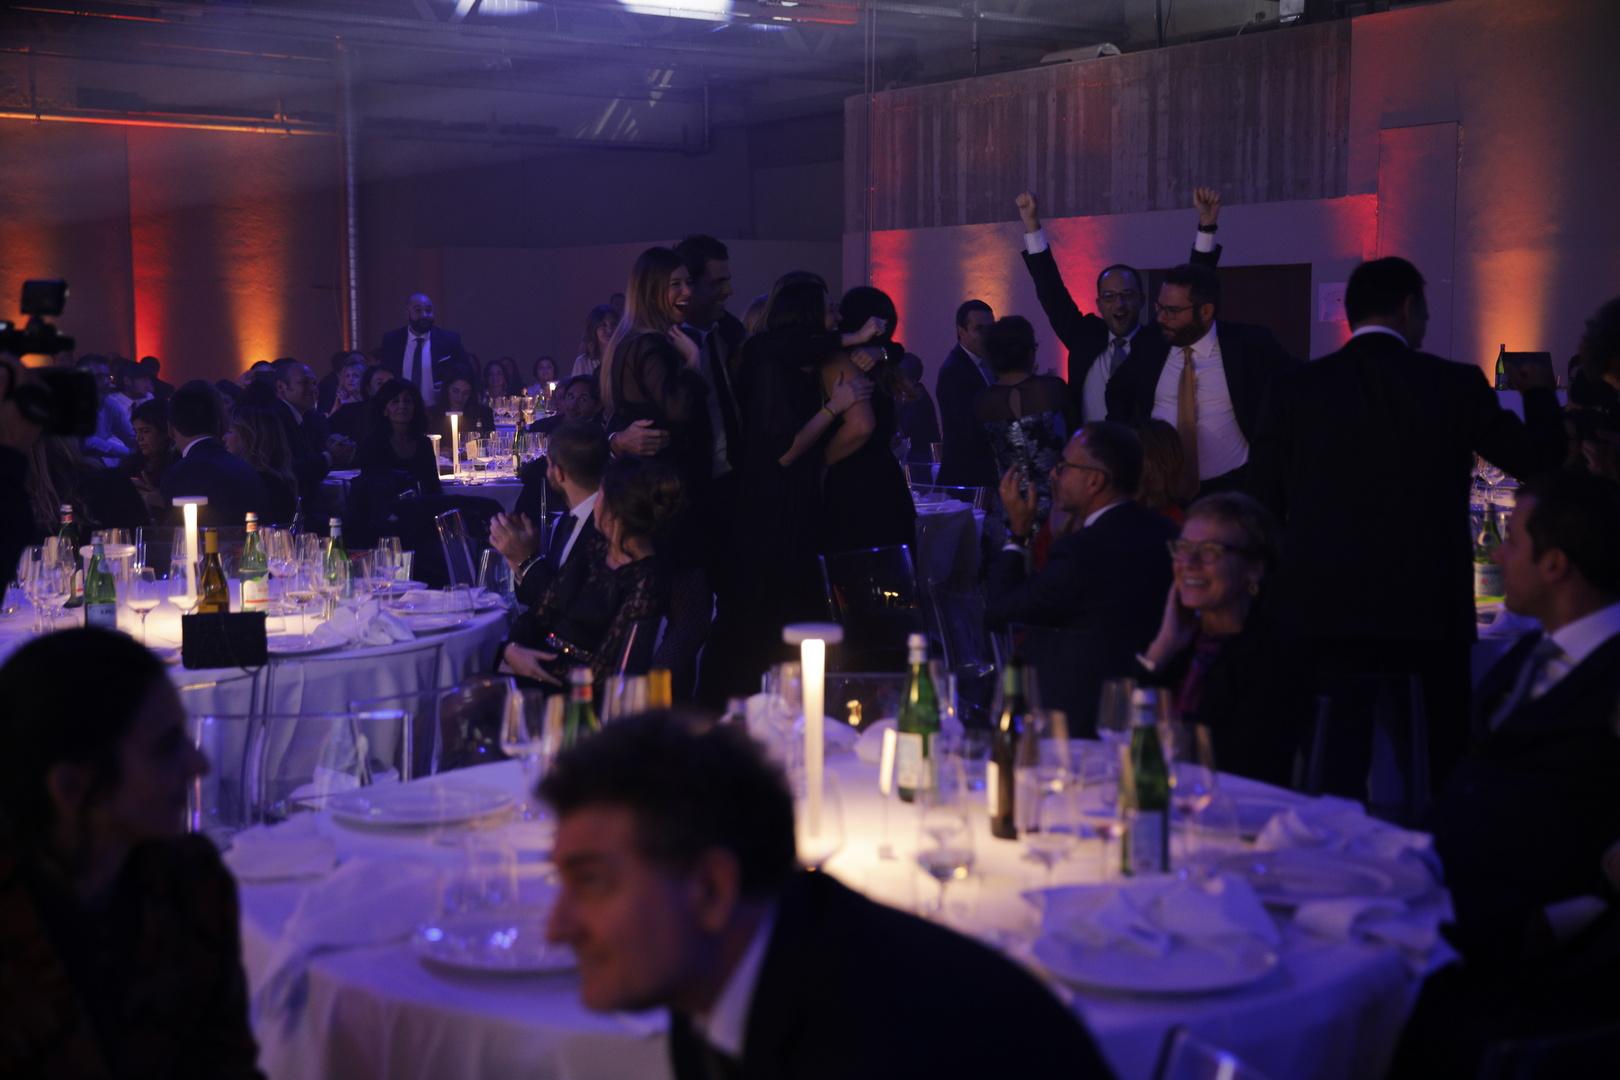 AboutPharma Digital Awards 2019 (15)